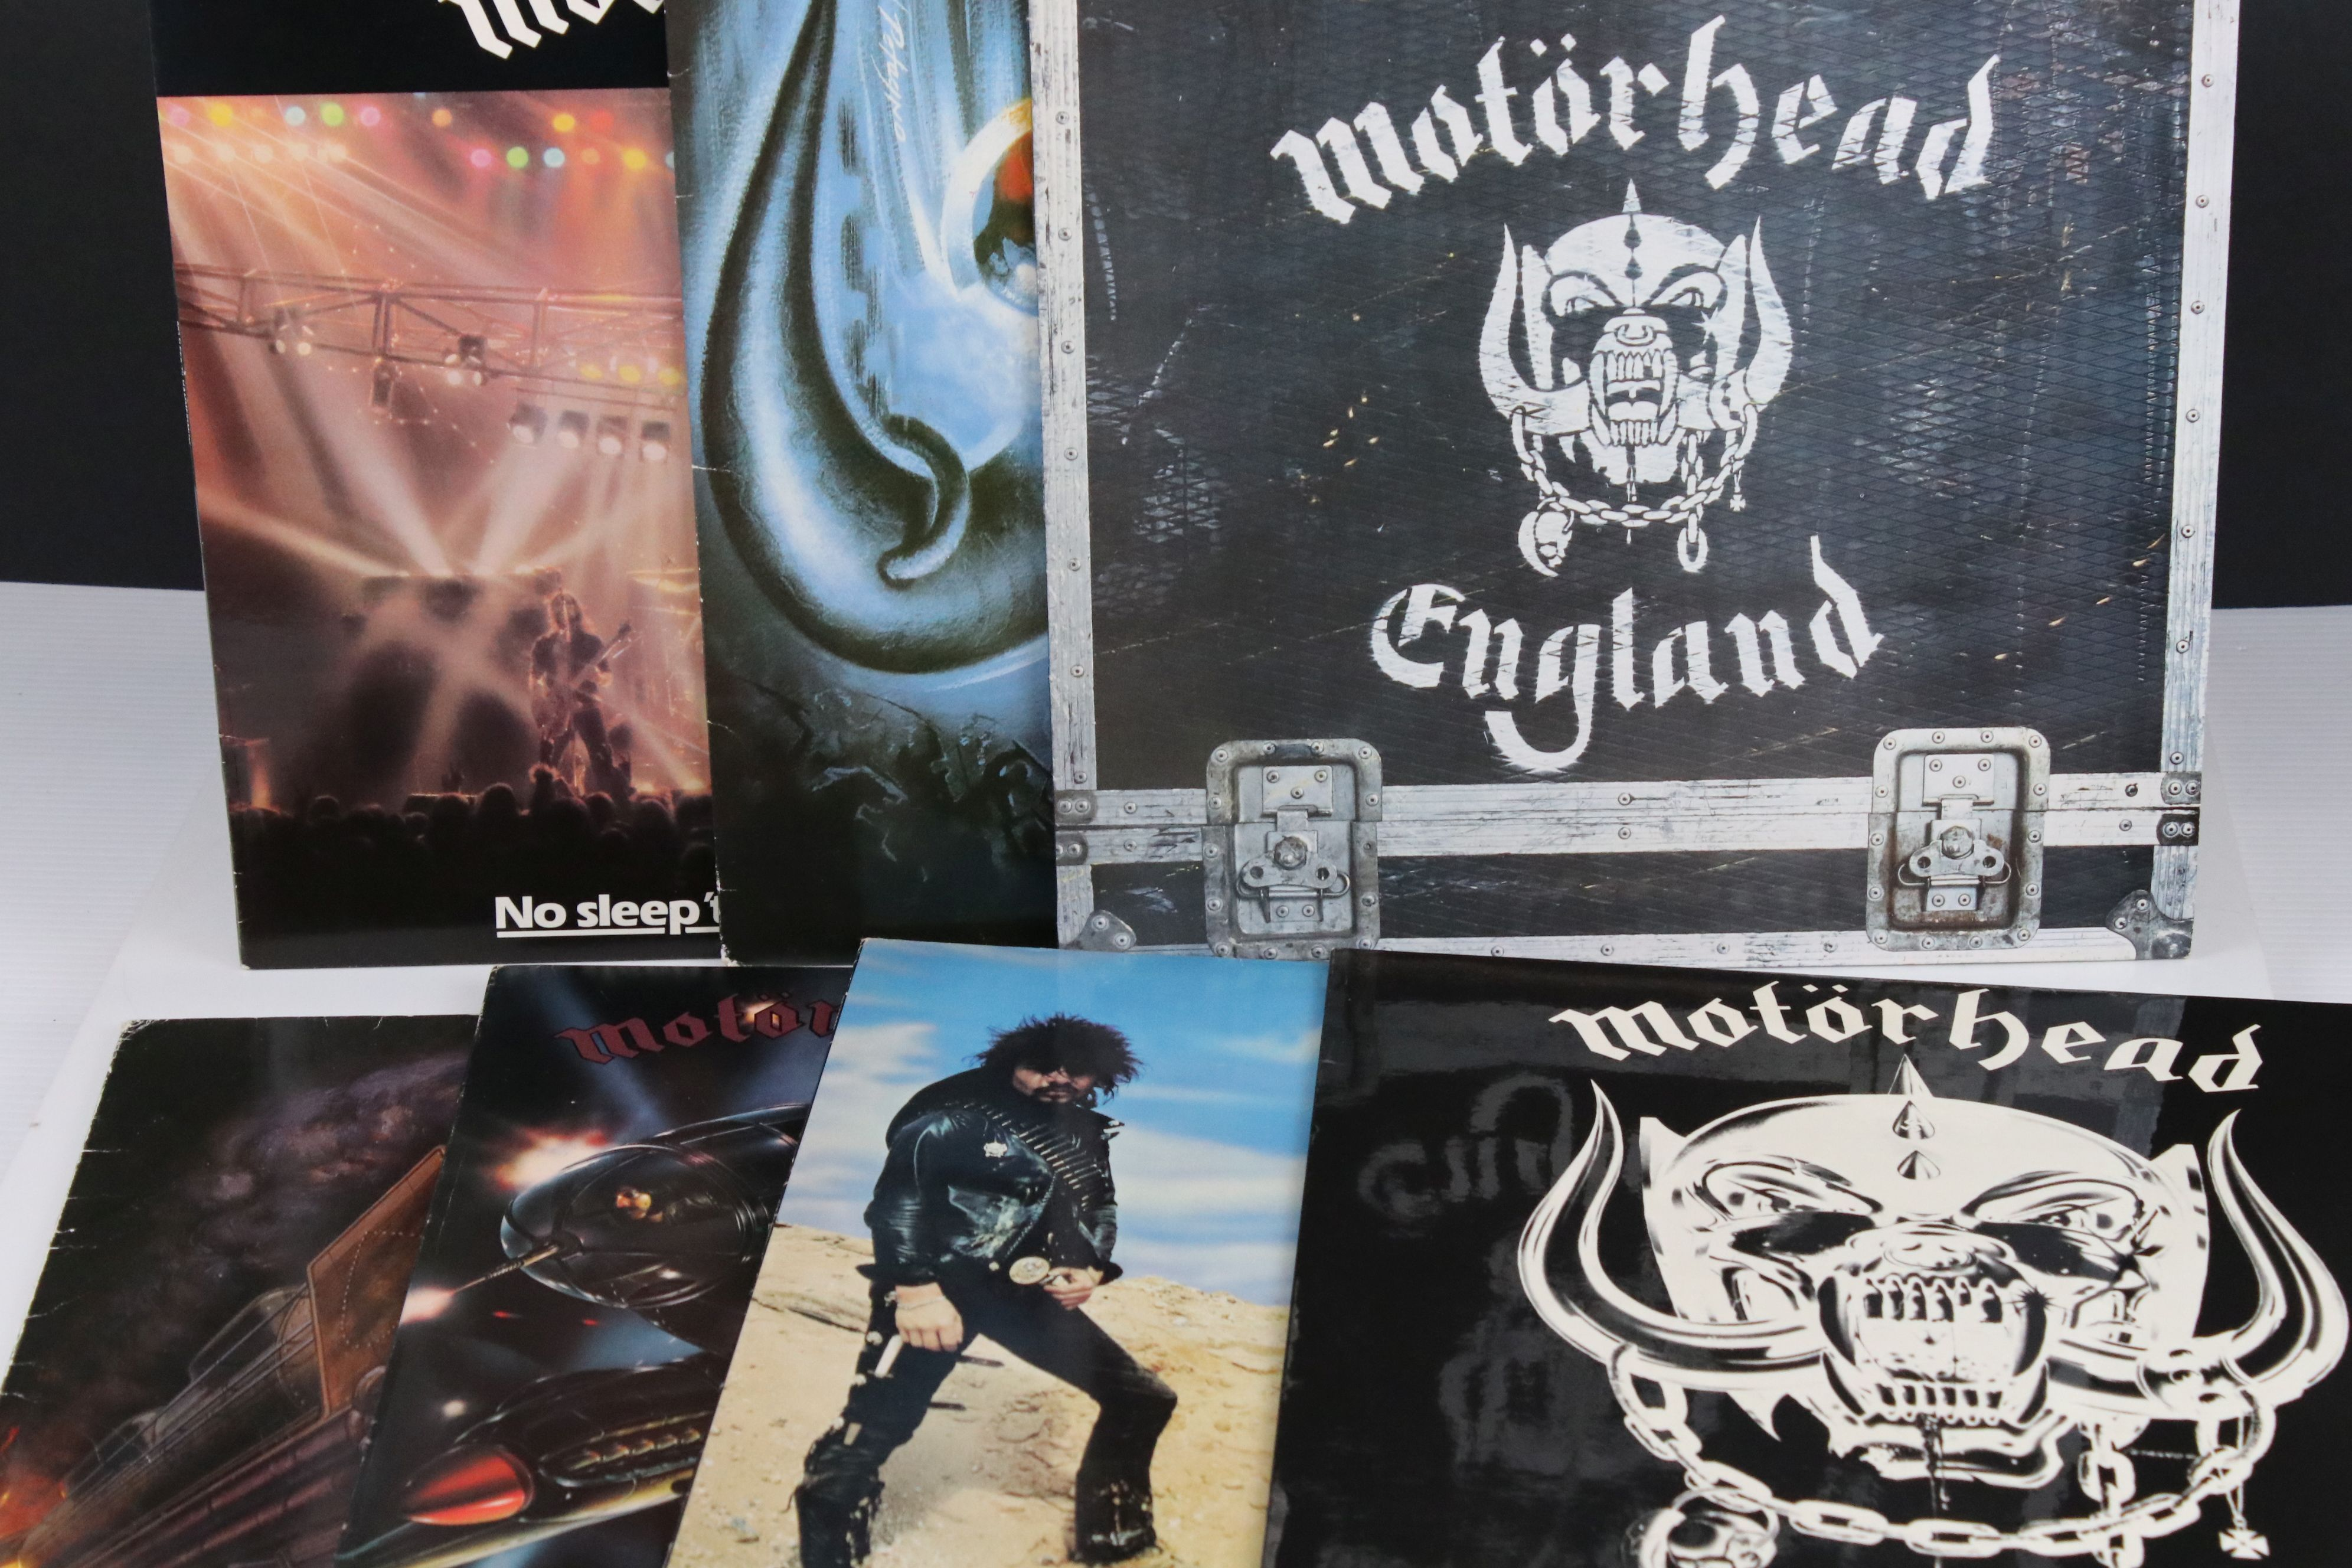 Vinyl - Motorhead 7 LP's to include Self Titled (WLK 2), No Sleep At All (GWLP31), Rock N Roll (